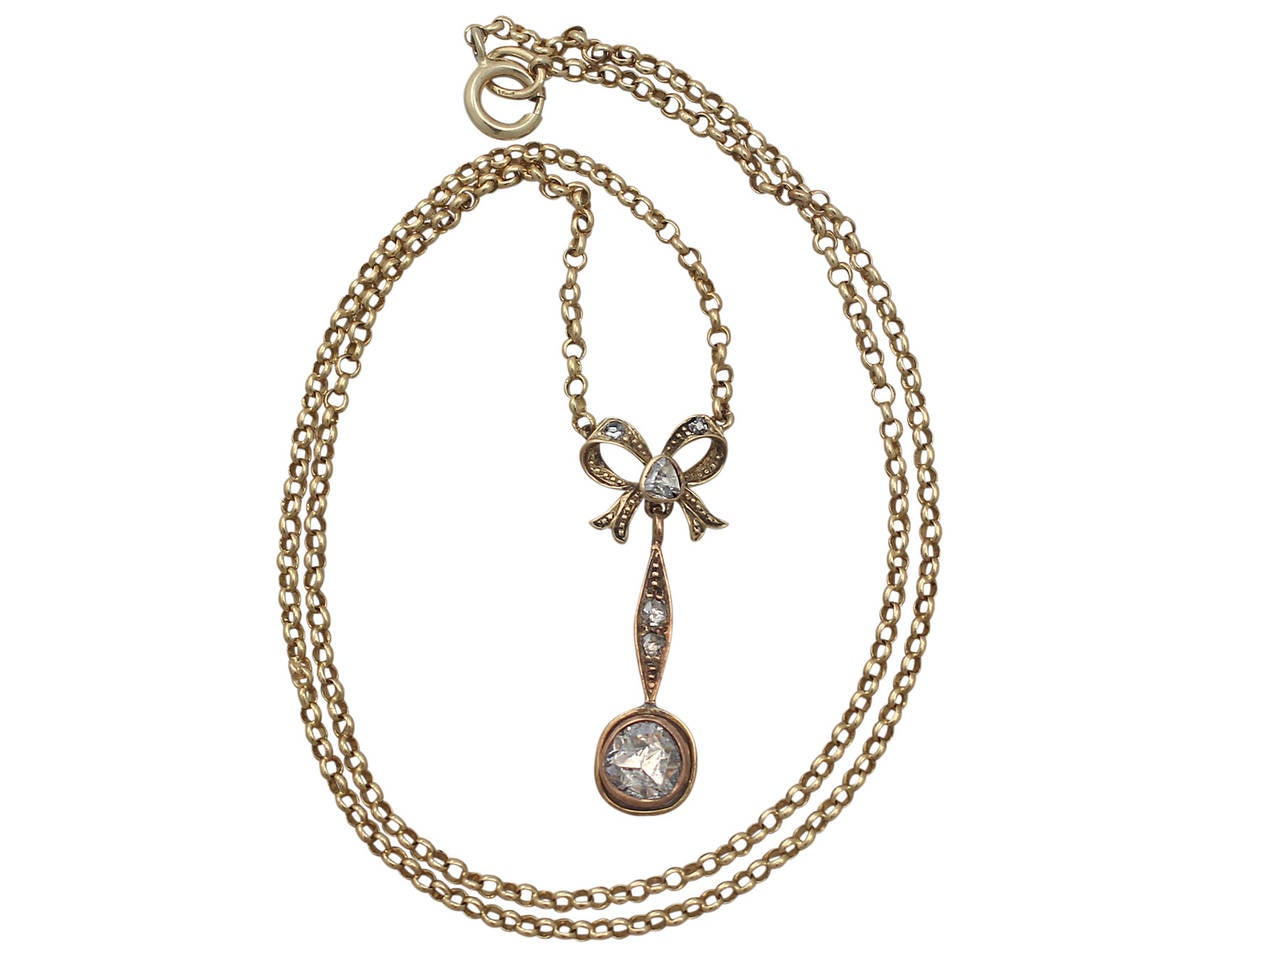 1.15Ct Diamond, 14k Yellow Gold Bow Pendant - Antique French Circa 1910 2